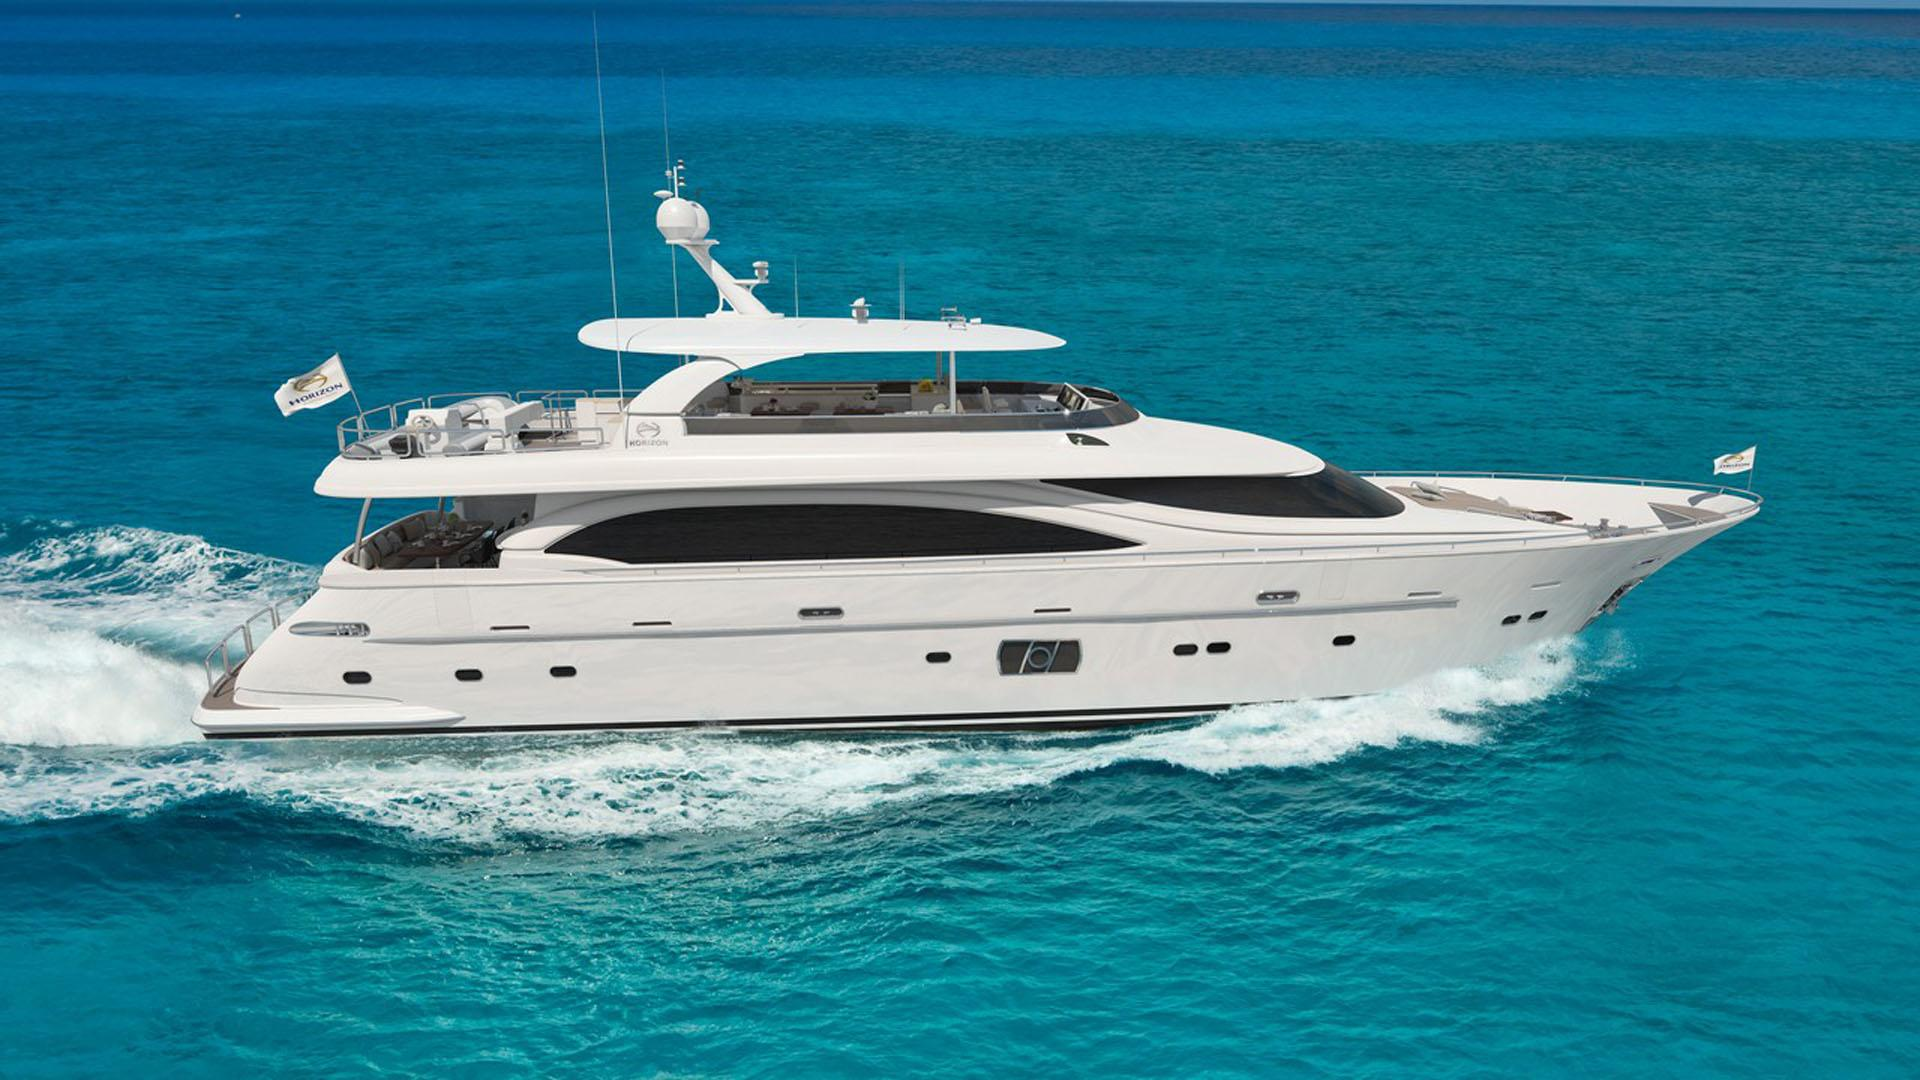 do it now motoryacht horizon e98 2017 30m profile rendering